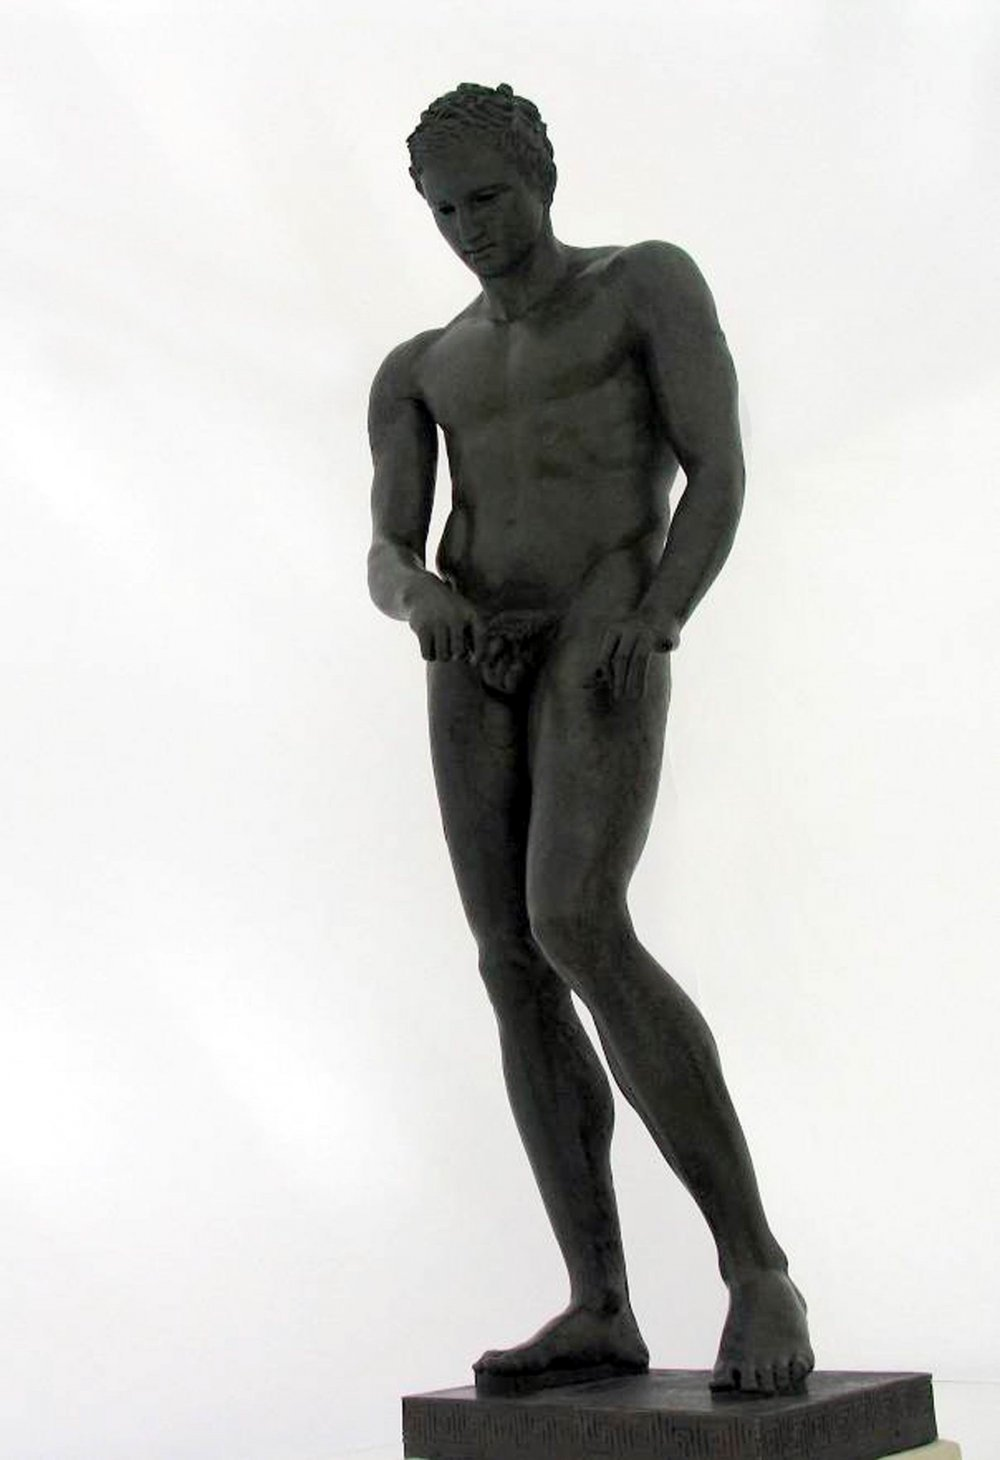 Kip Apoksiomena Izlozen U British Museumu Tportal